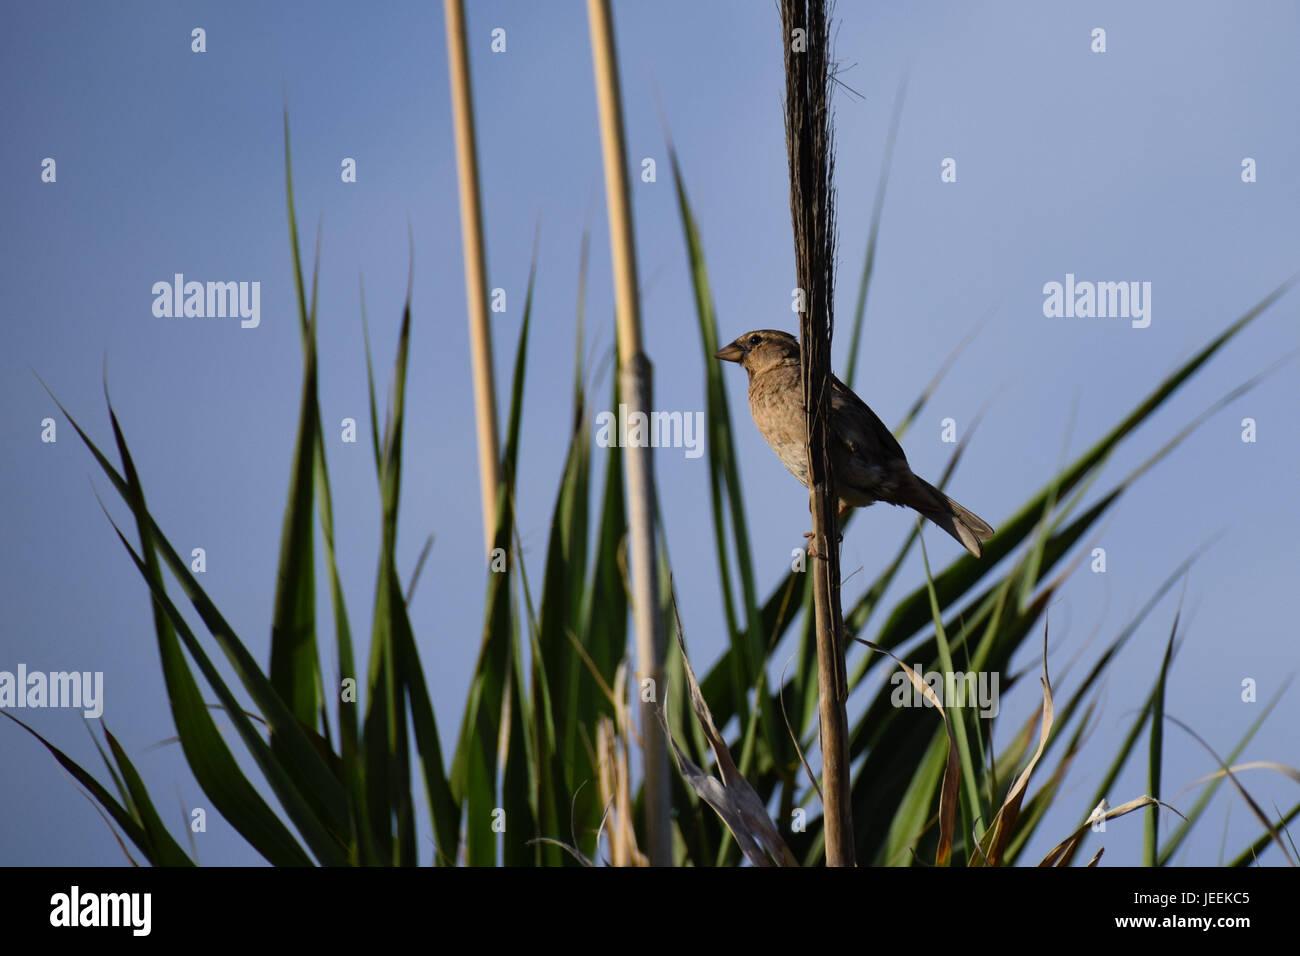 Wild bird amongst green leaves - Stock Image